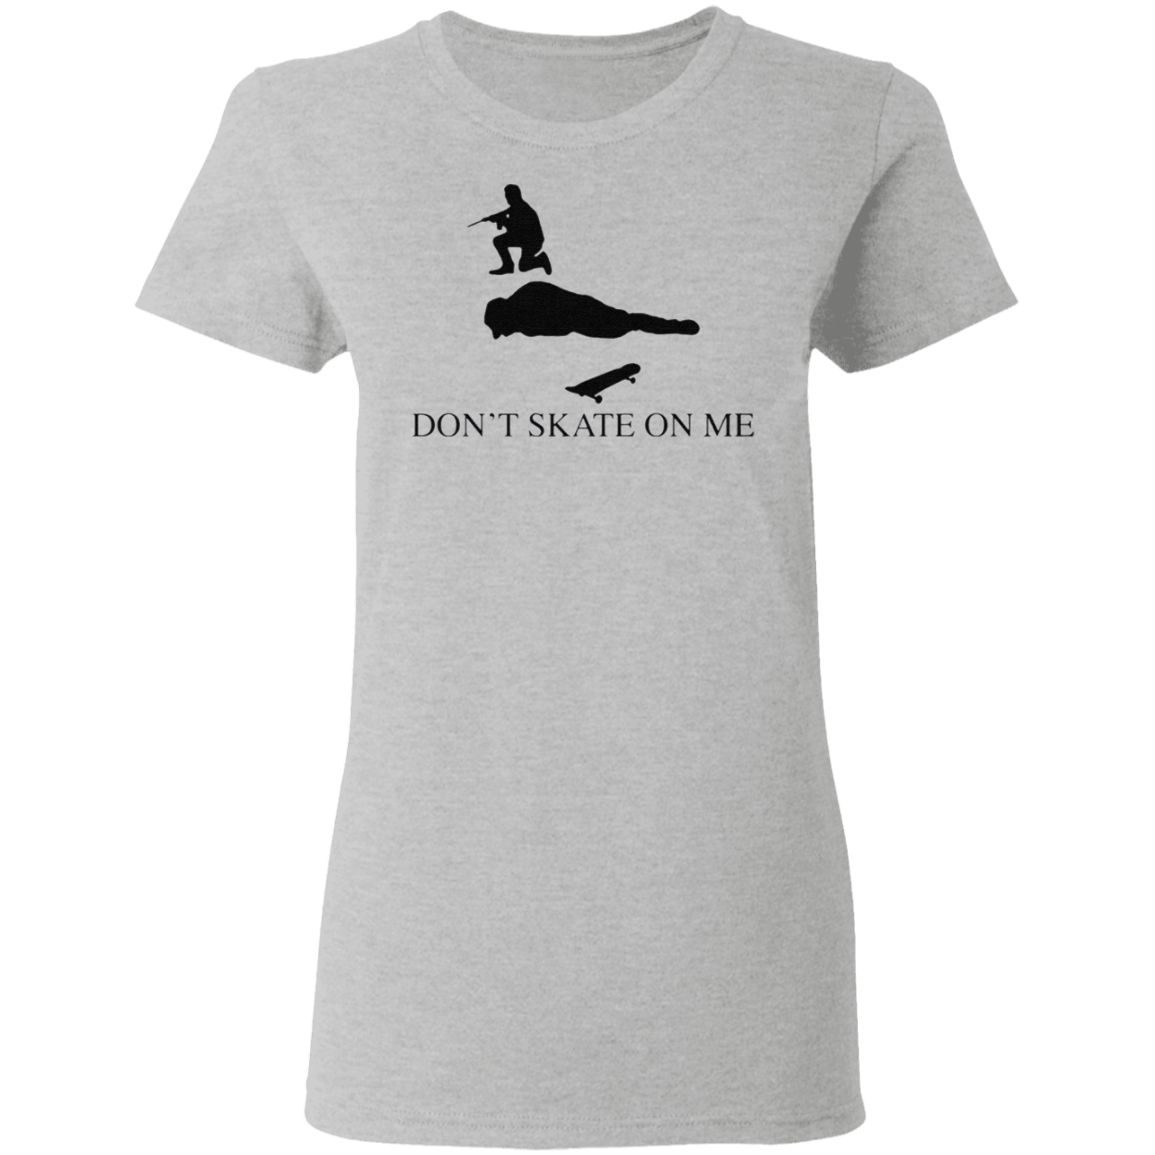 Don't skate on me t shirt